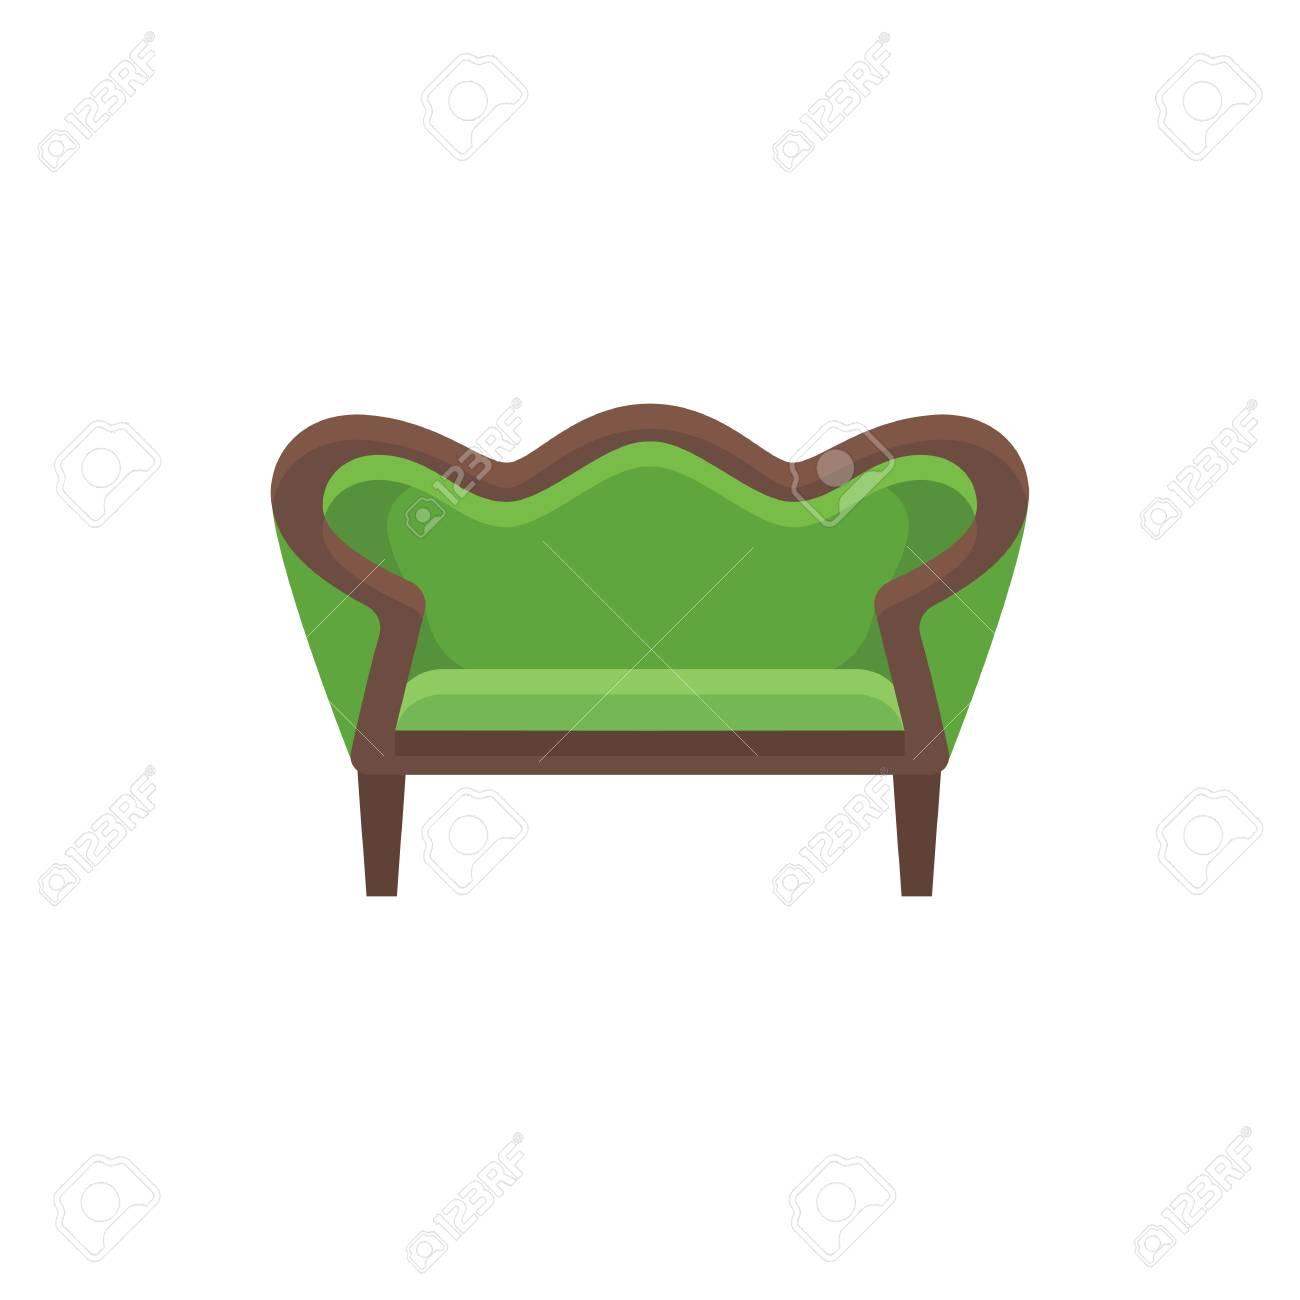 Miraculous Green Vintage Loveseat Double Sofa Vector Illustration Flat Machost Co Dining Chair Design Ideas Machostcouk